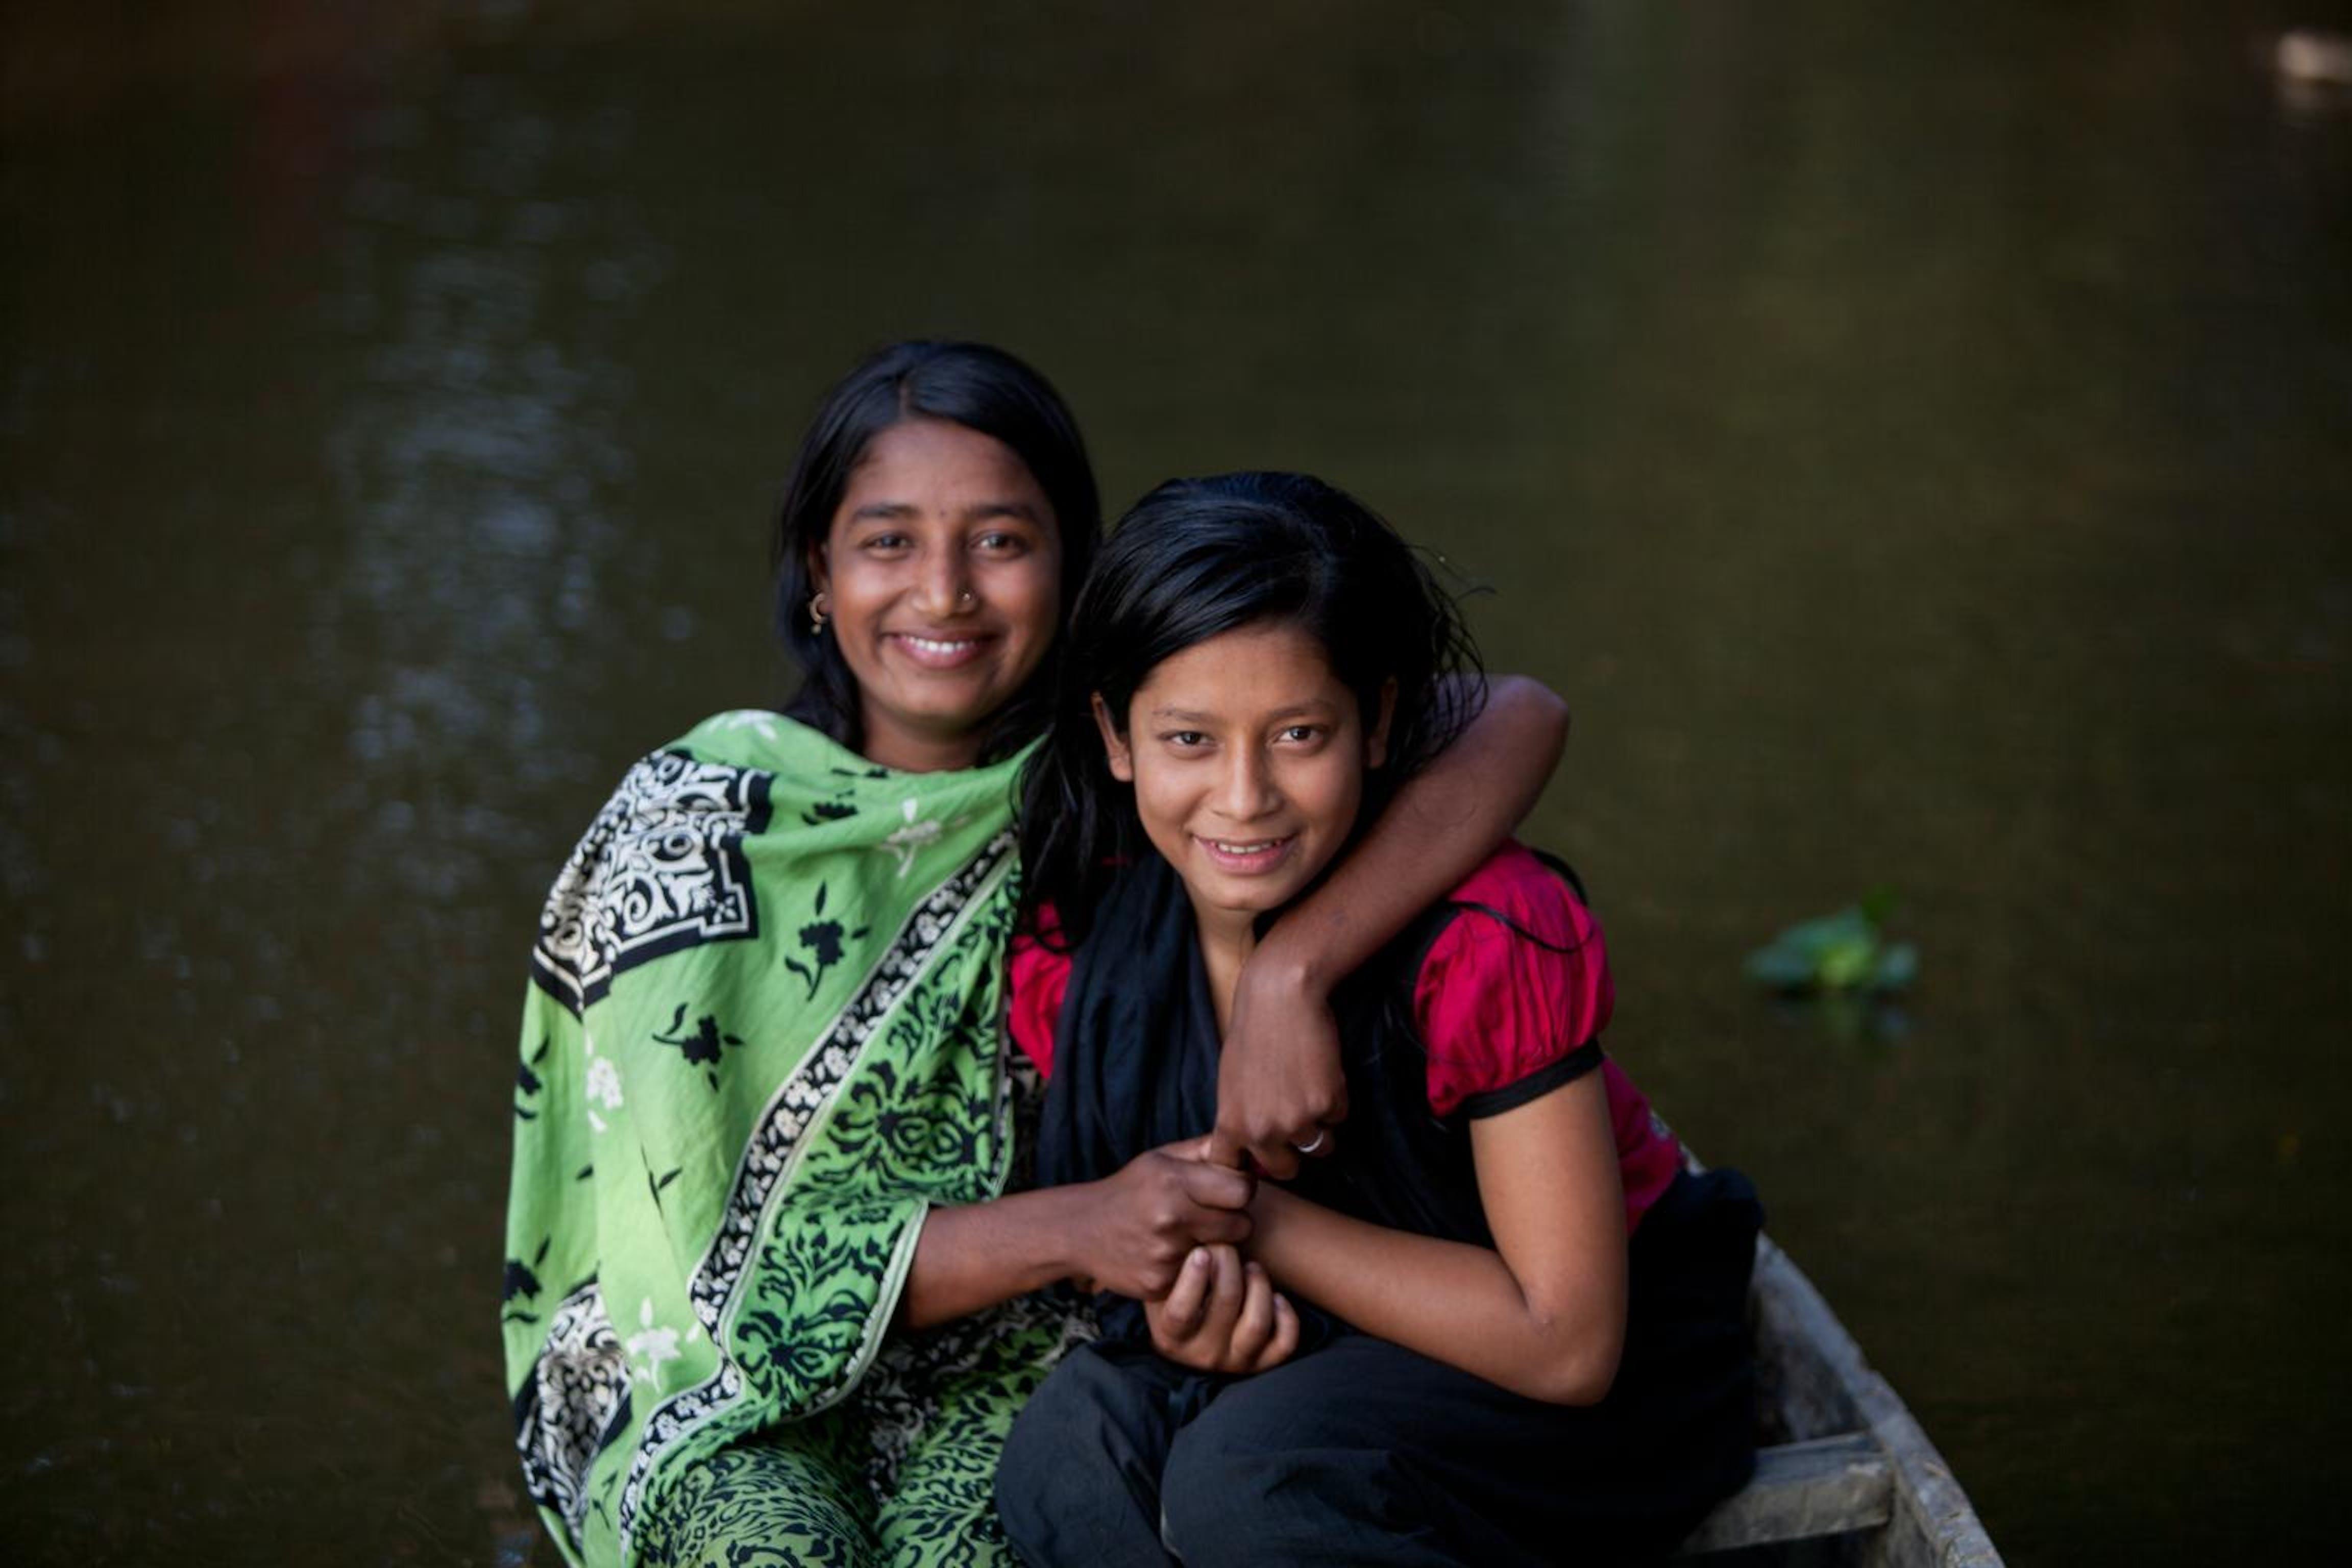 © UNICEFBANA2014-00455MawaBANGLADESH, 2014